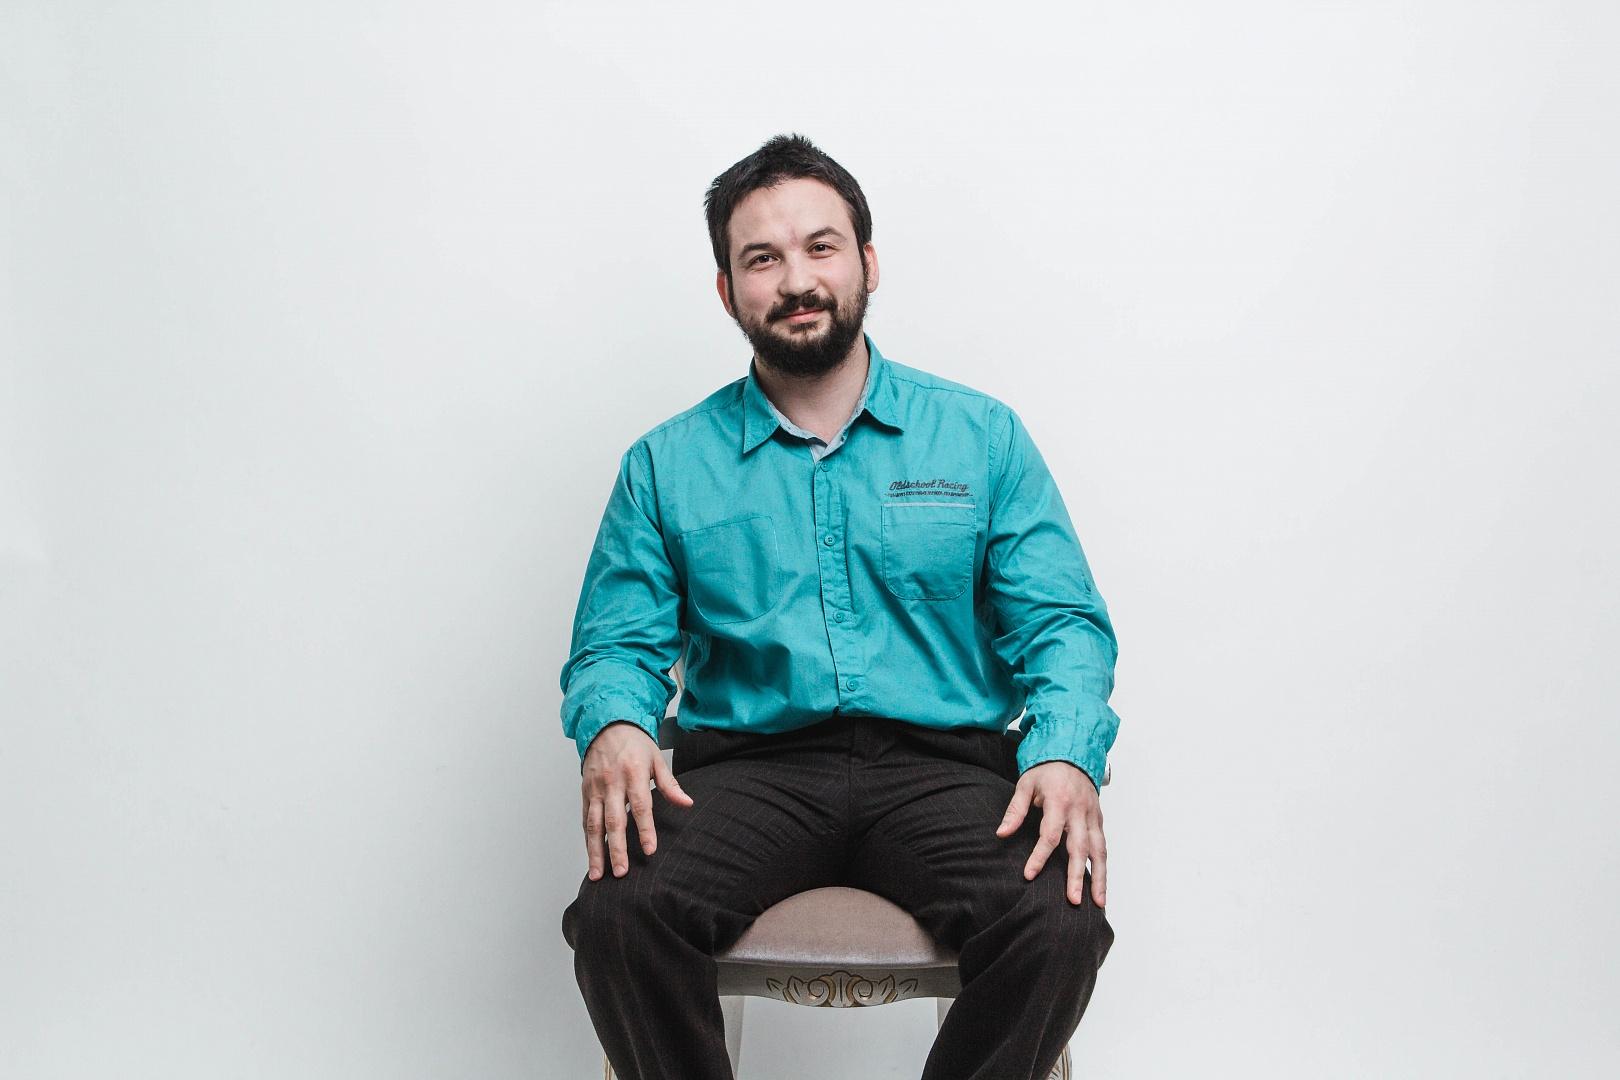 Психолог Михаил Козлов